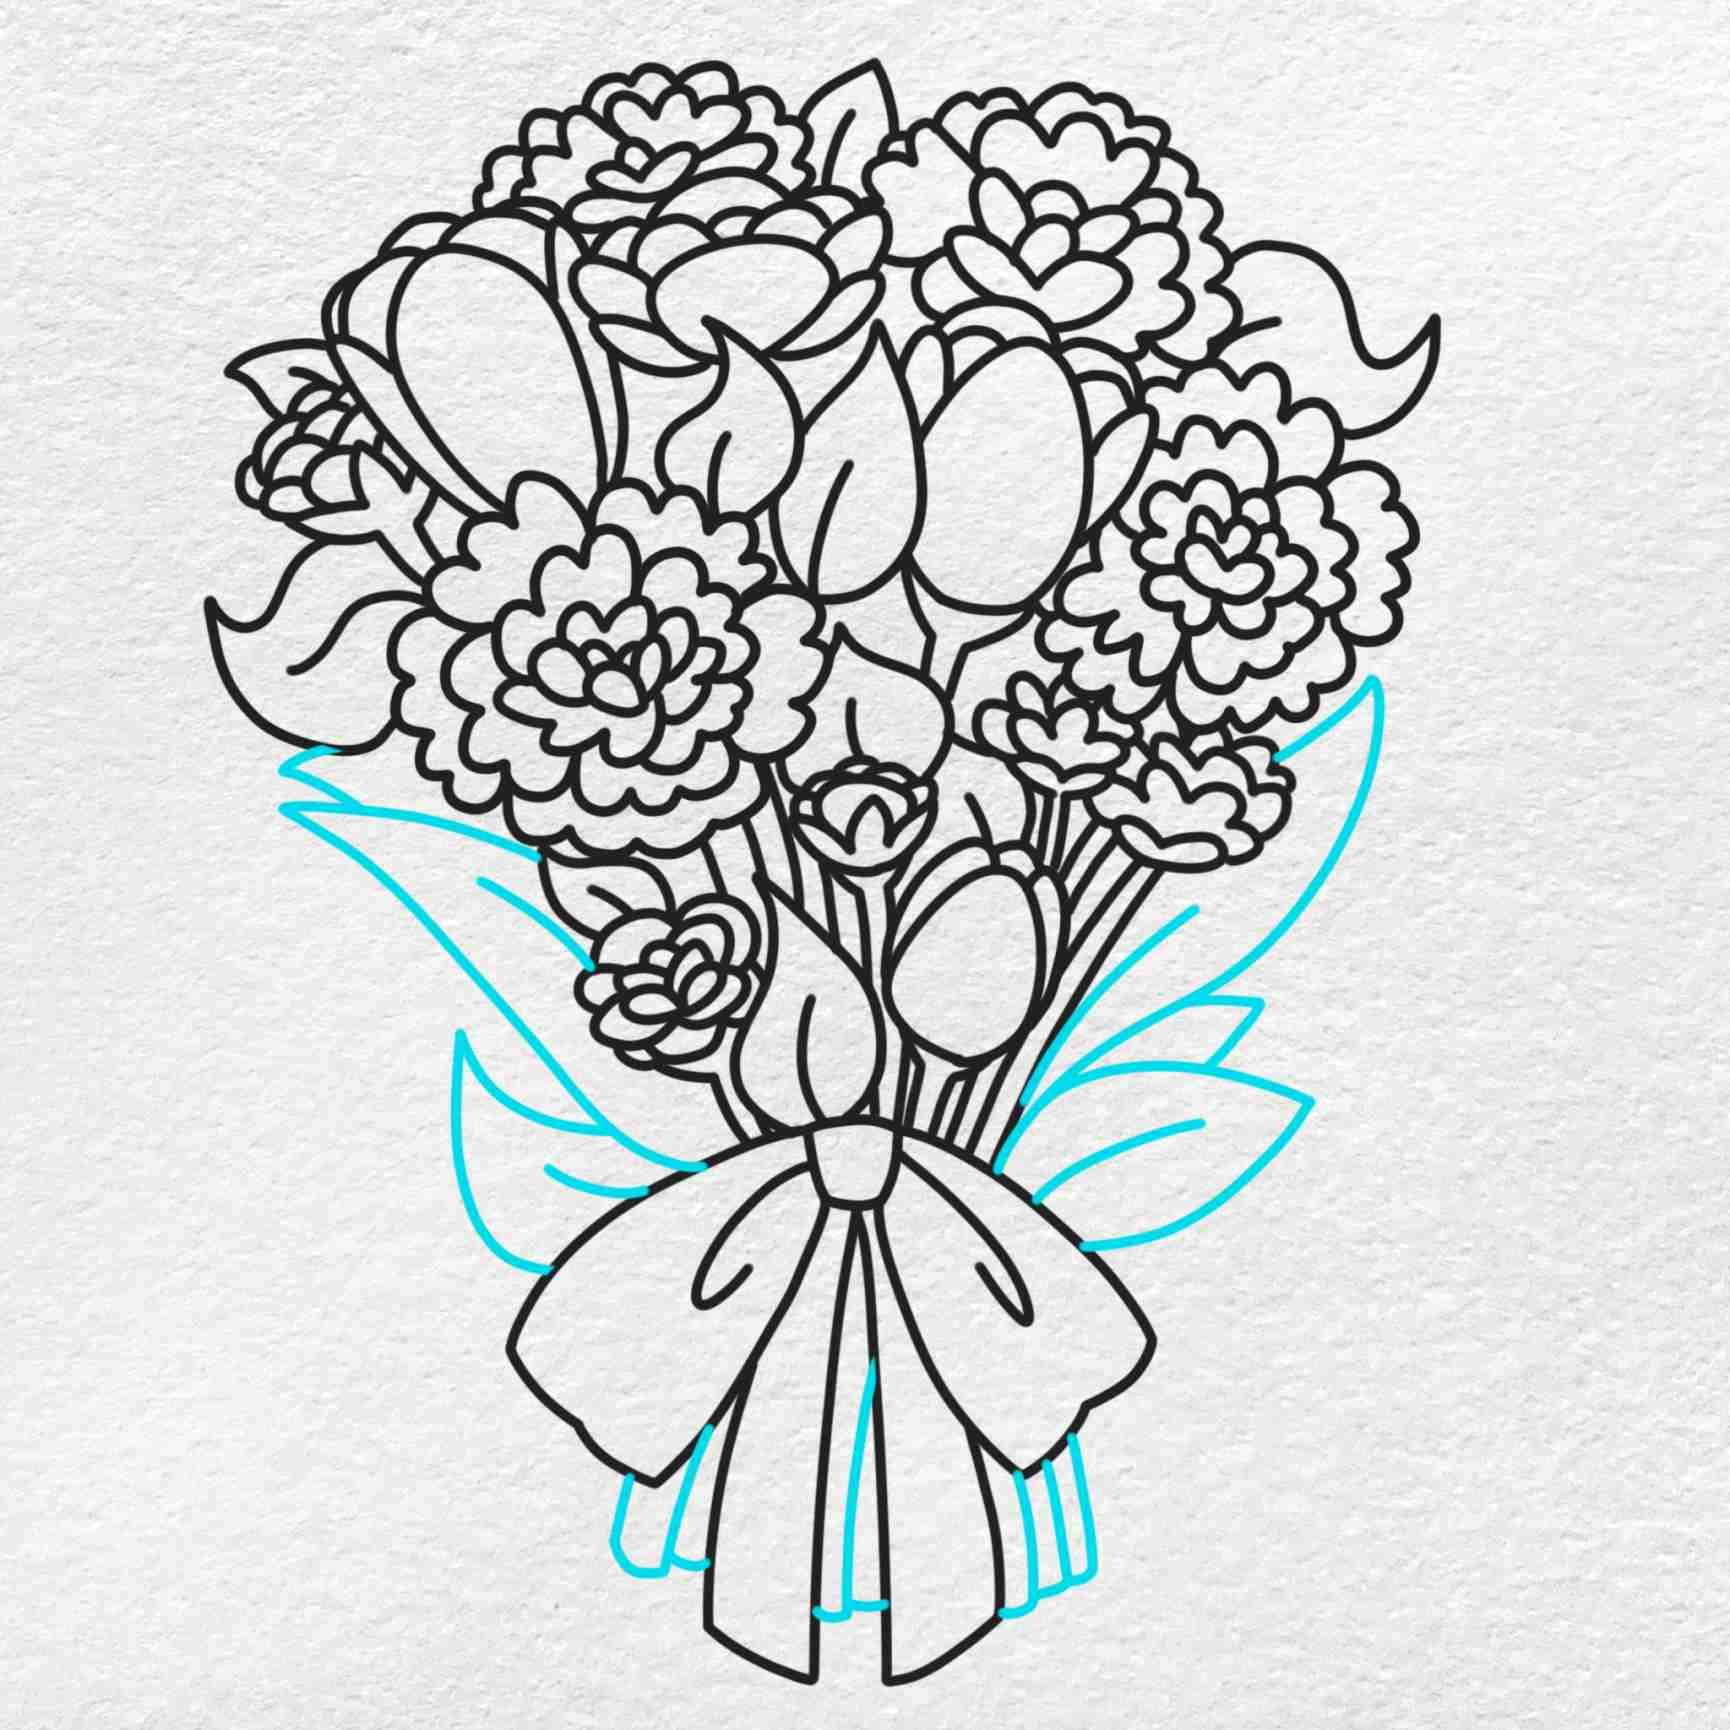 Spring Flowers Drawing: Step 8